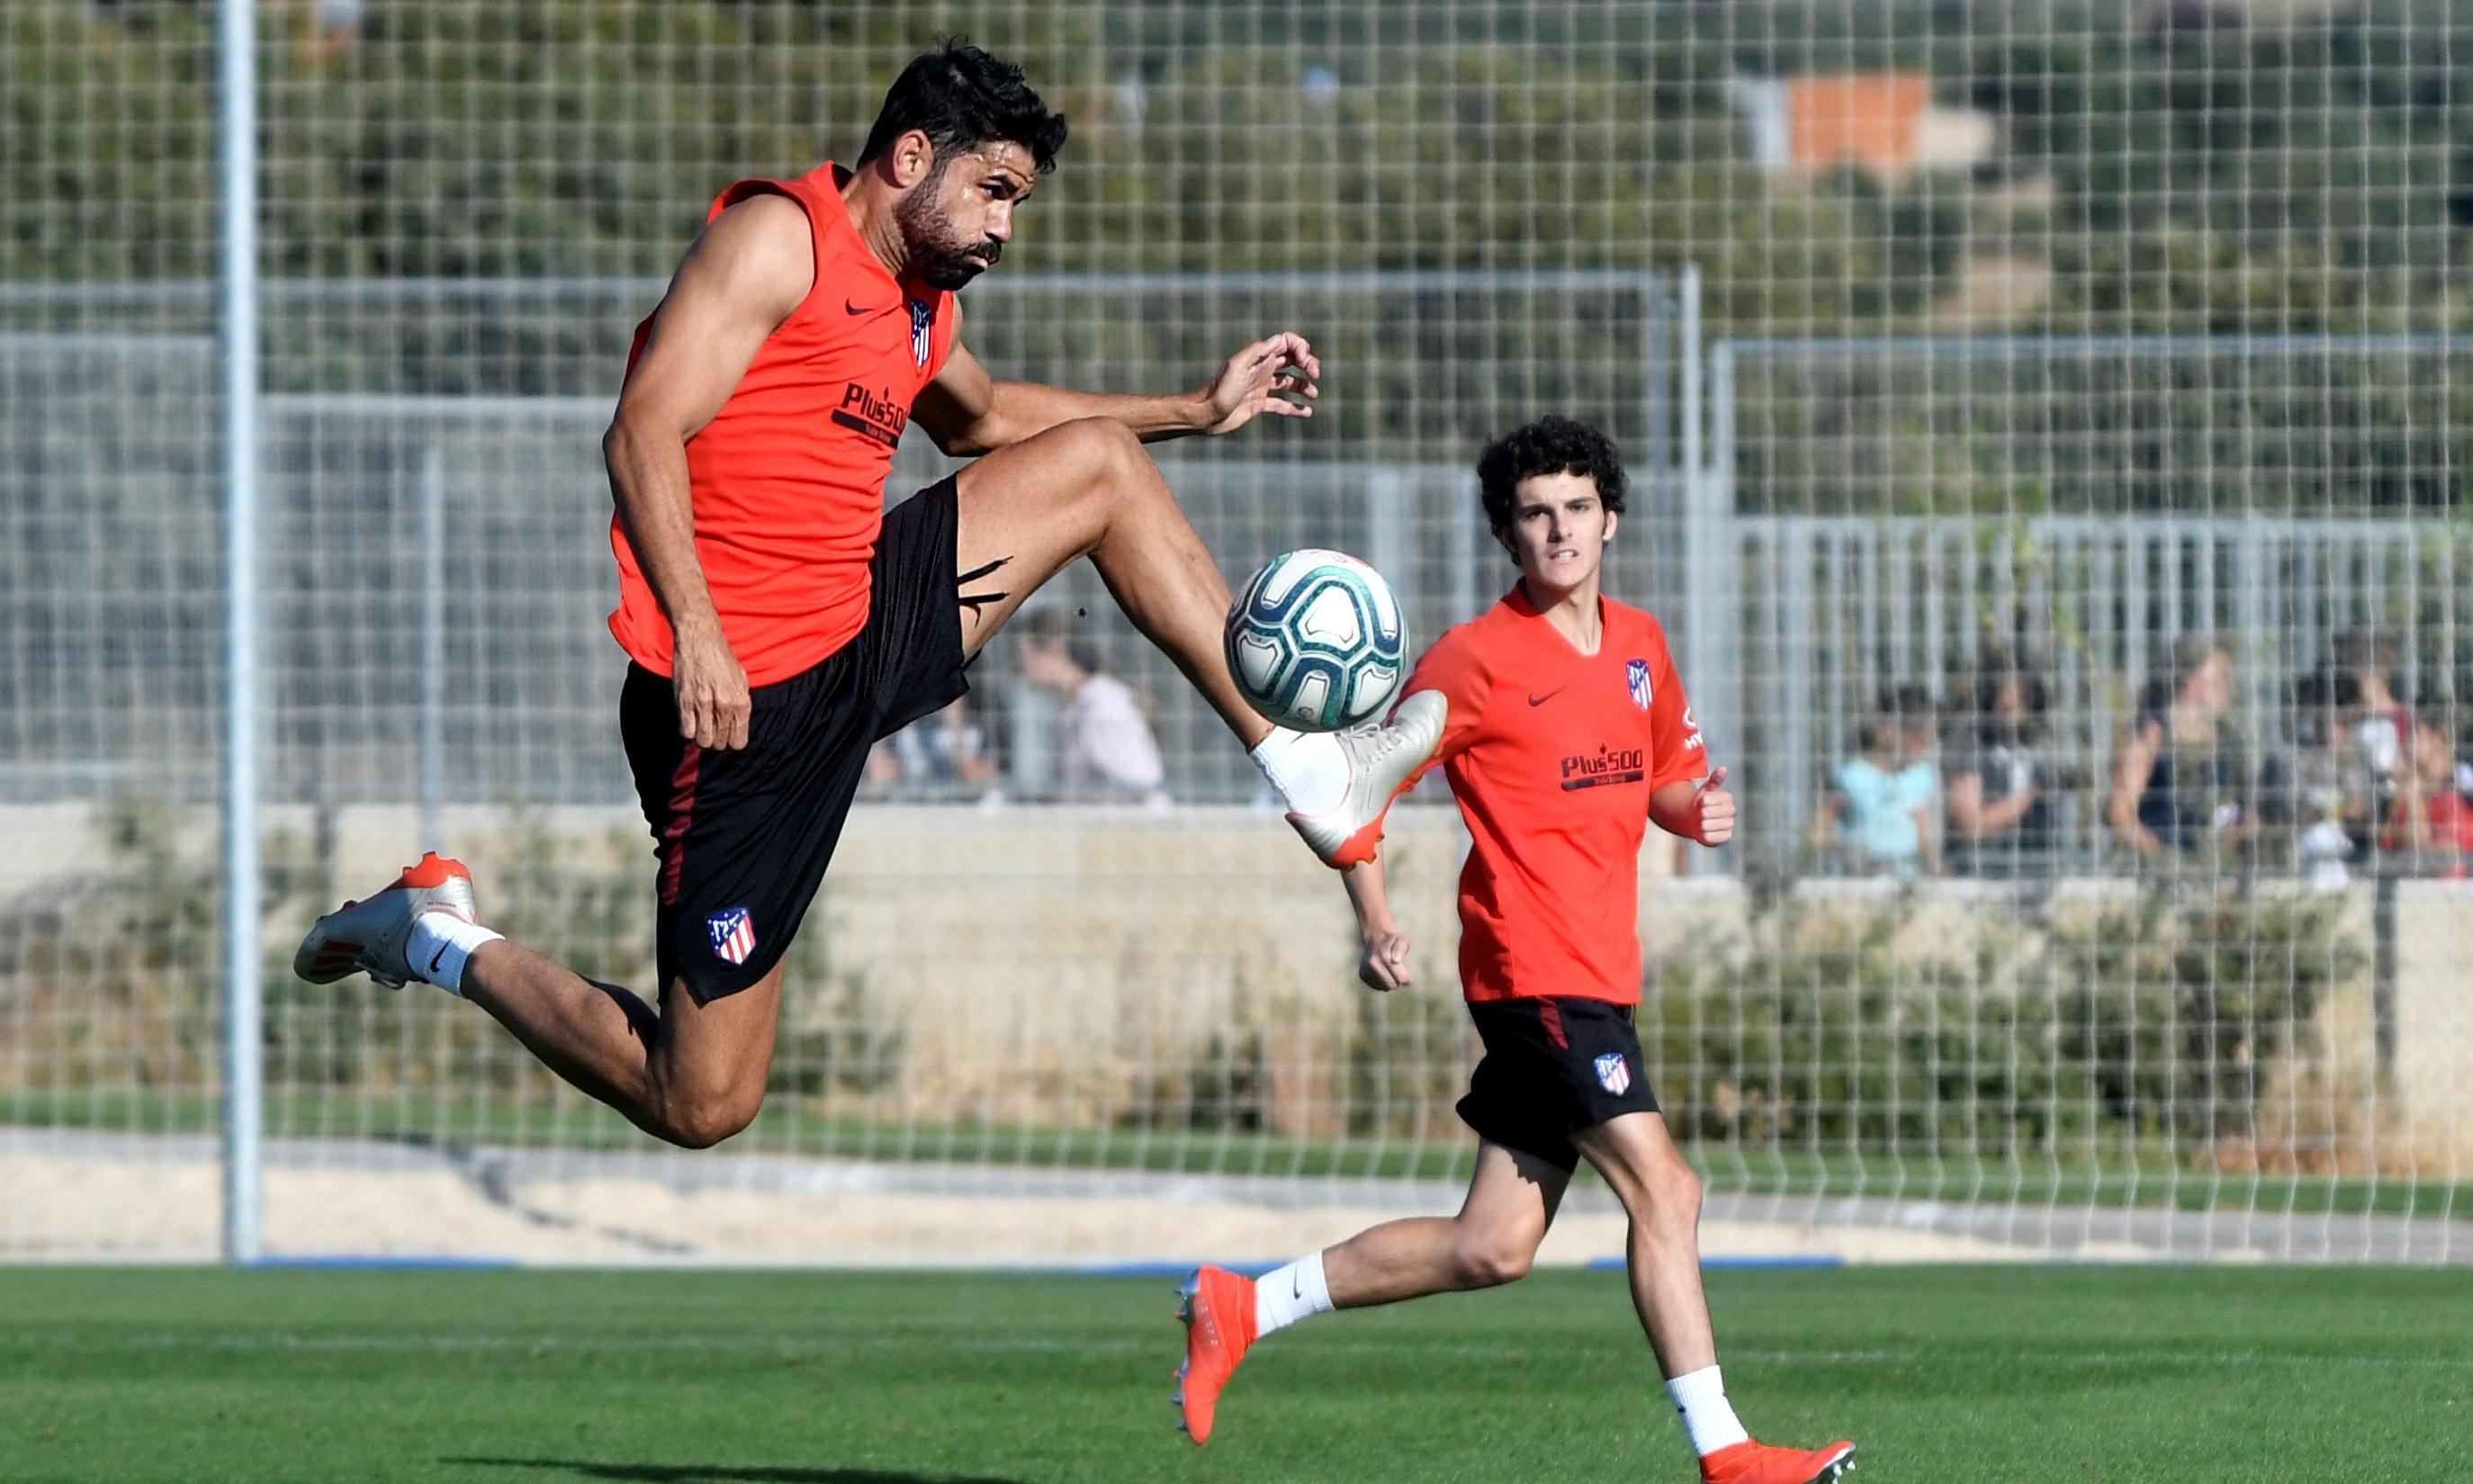 Football transfer rumours: Diego Costa heading for Everton?